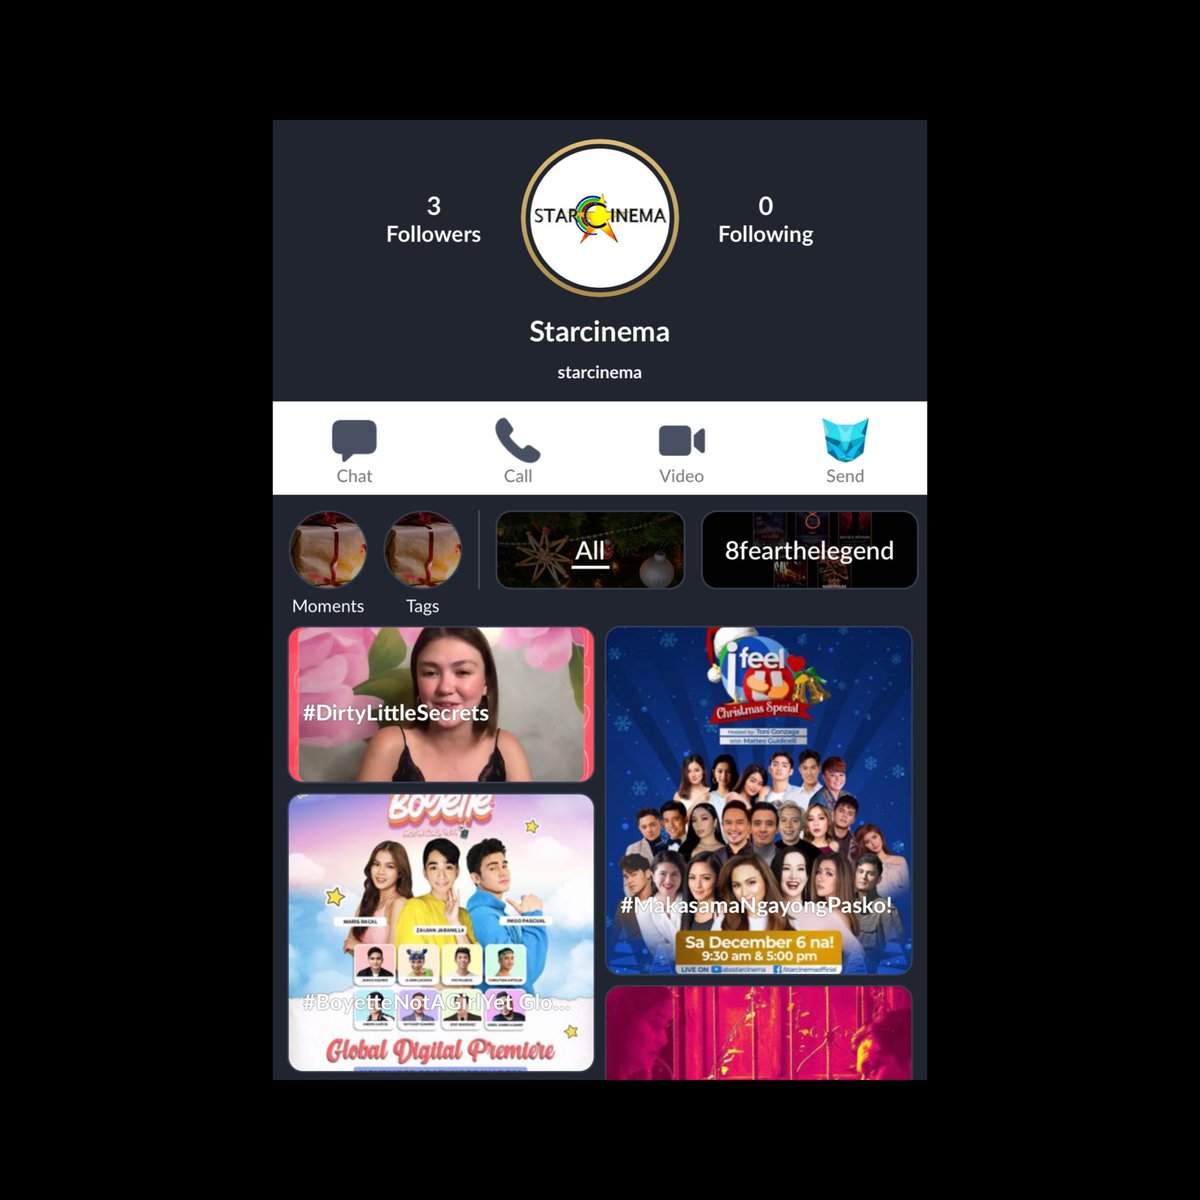 Flex ko lang! Star Cinema is now on LYKA! 💎 Follow niyo na guys for updates on our movies. 💫 #StarCinemaOnLYKA #LYKAmovies